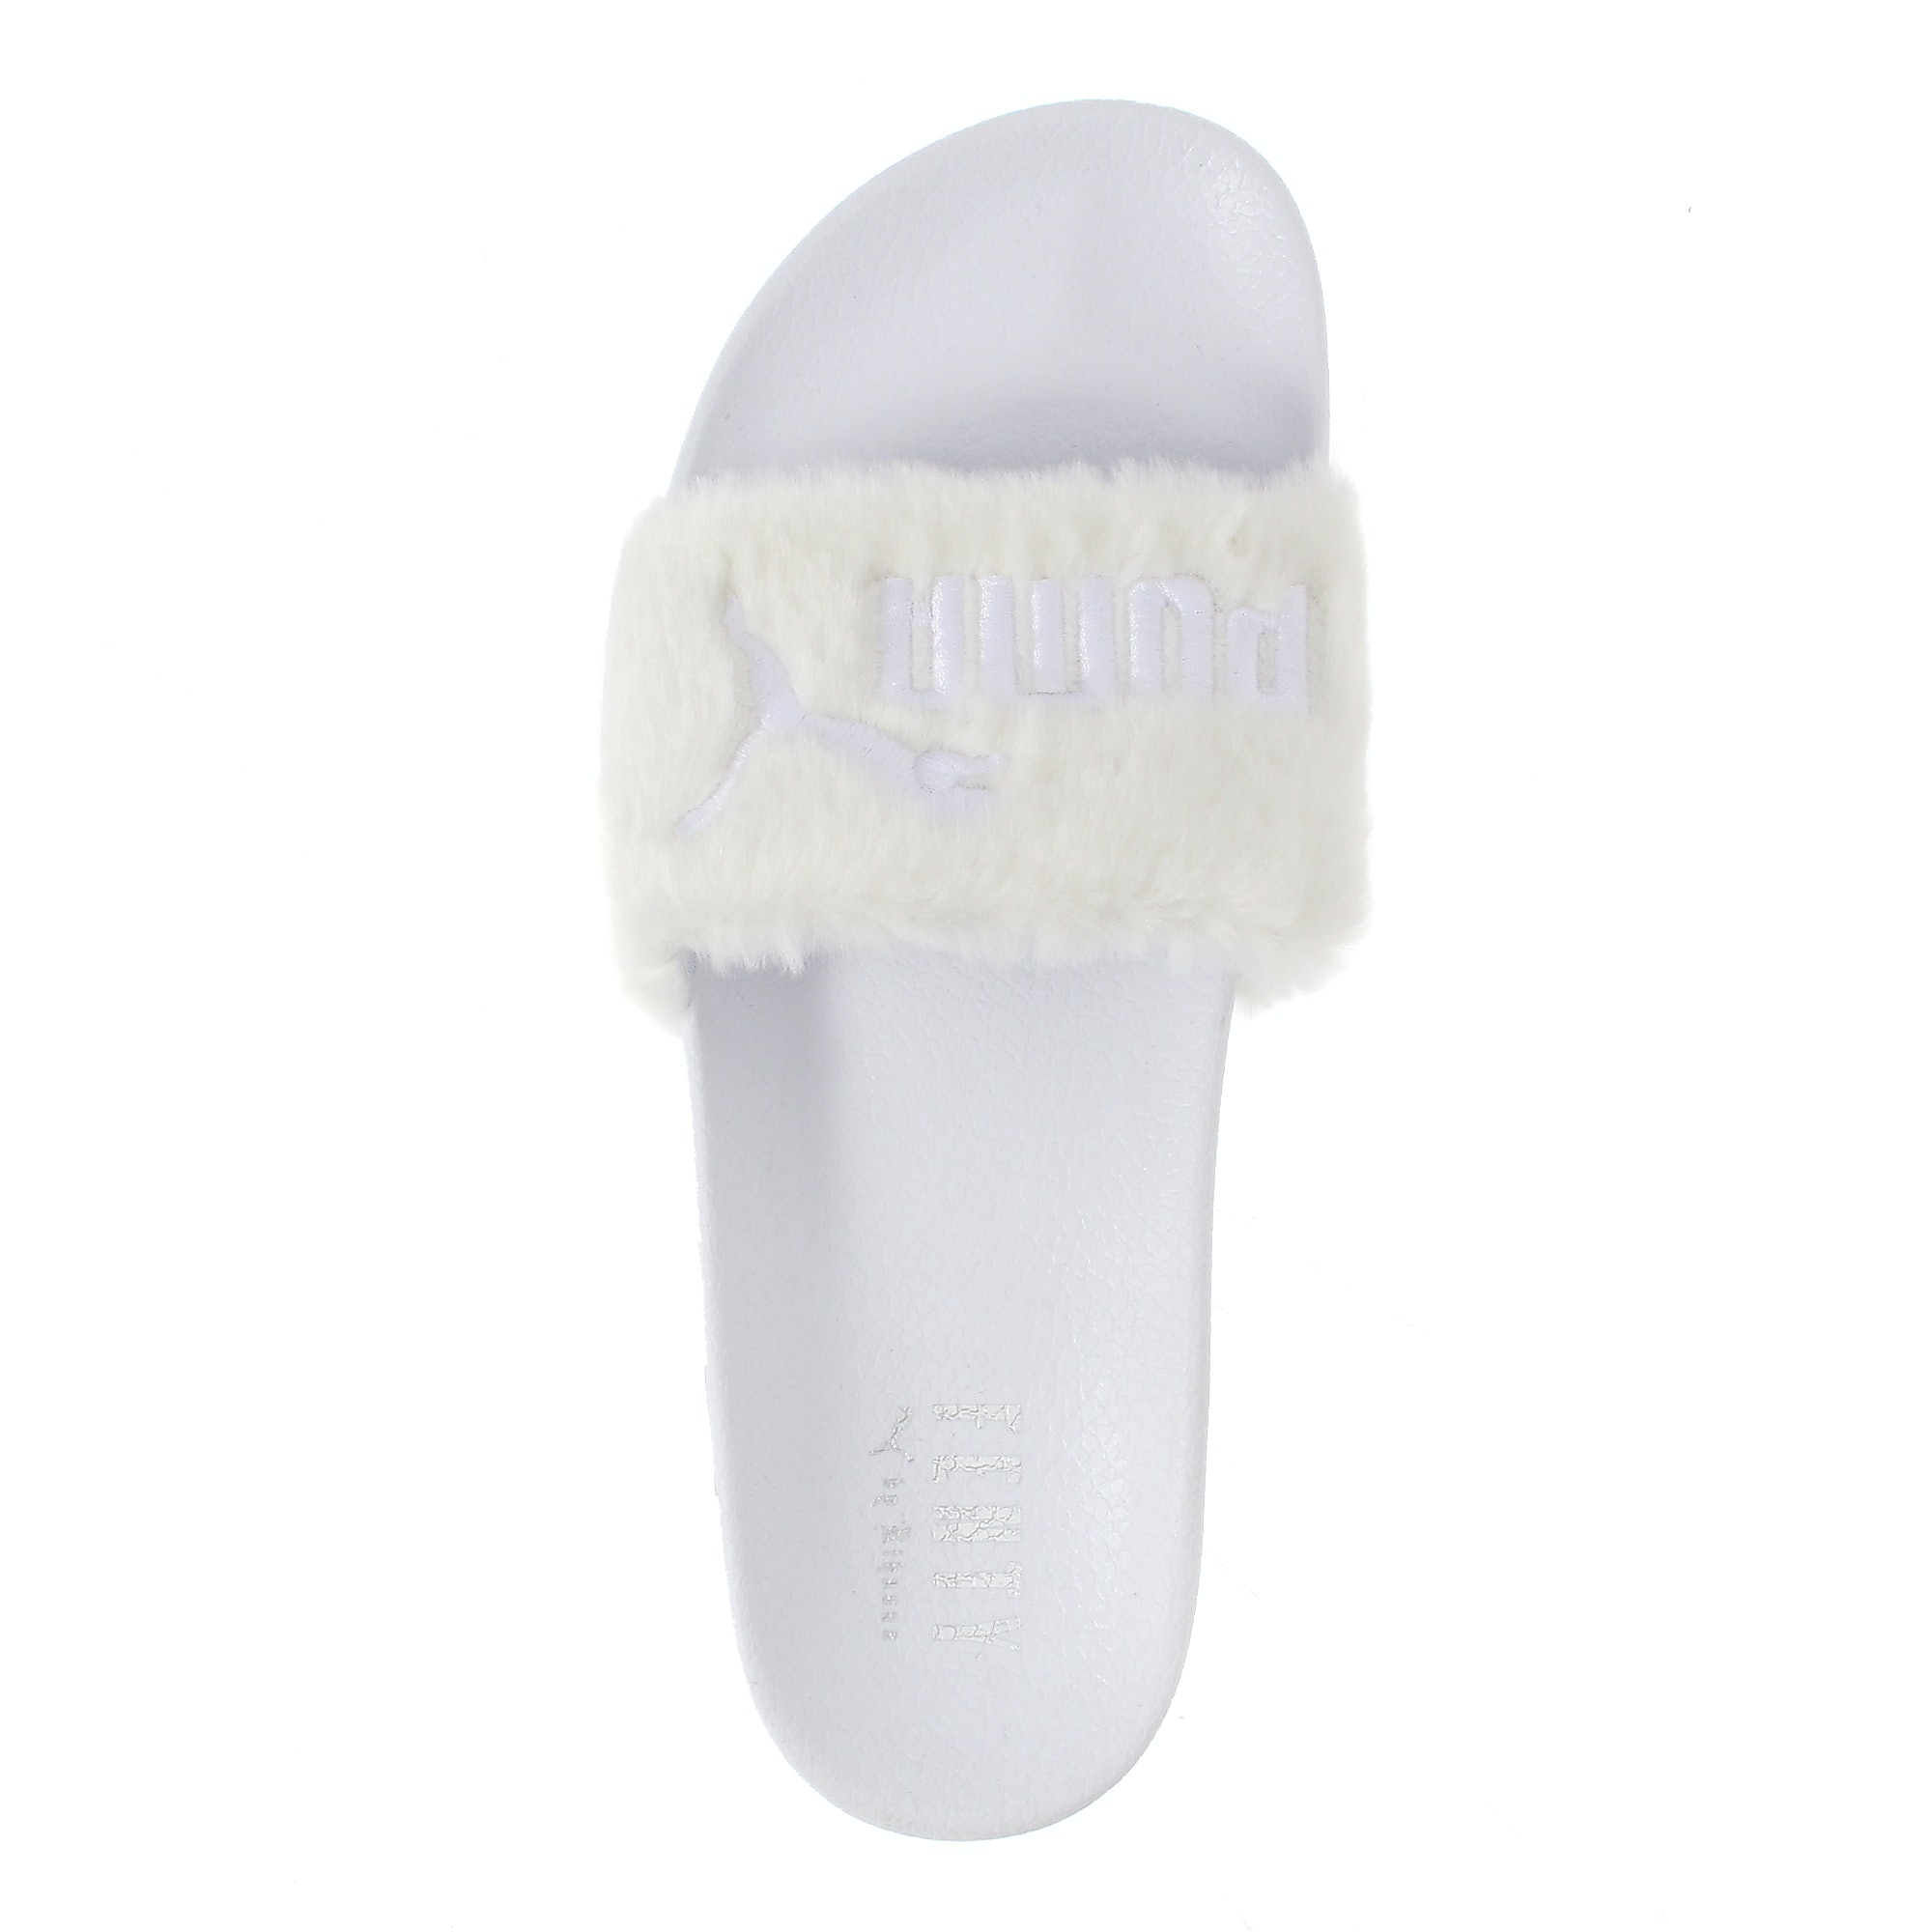 Rihanna s Fur Slides Crashed Puma s Website 0b19fc4b7